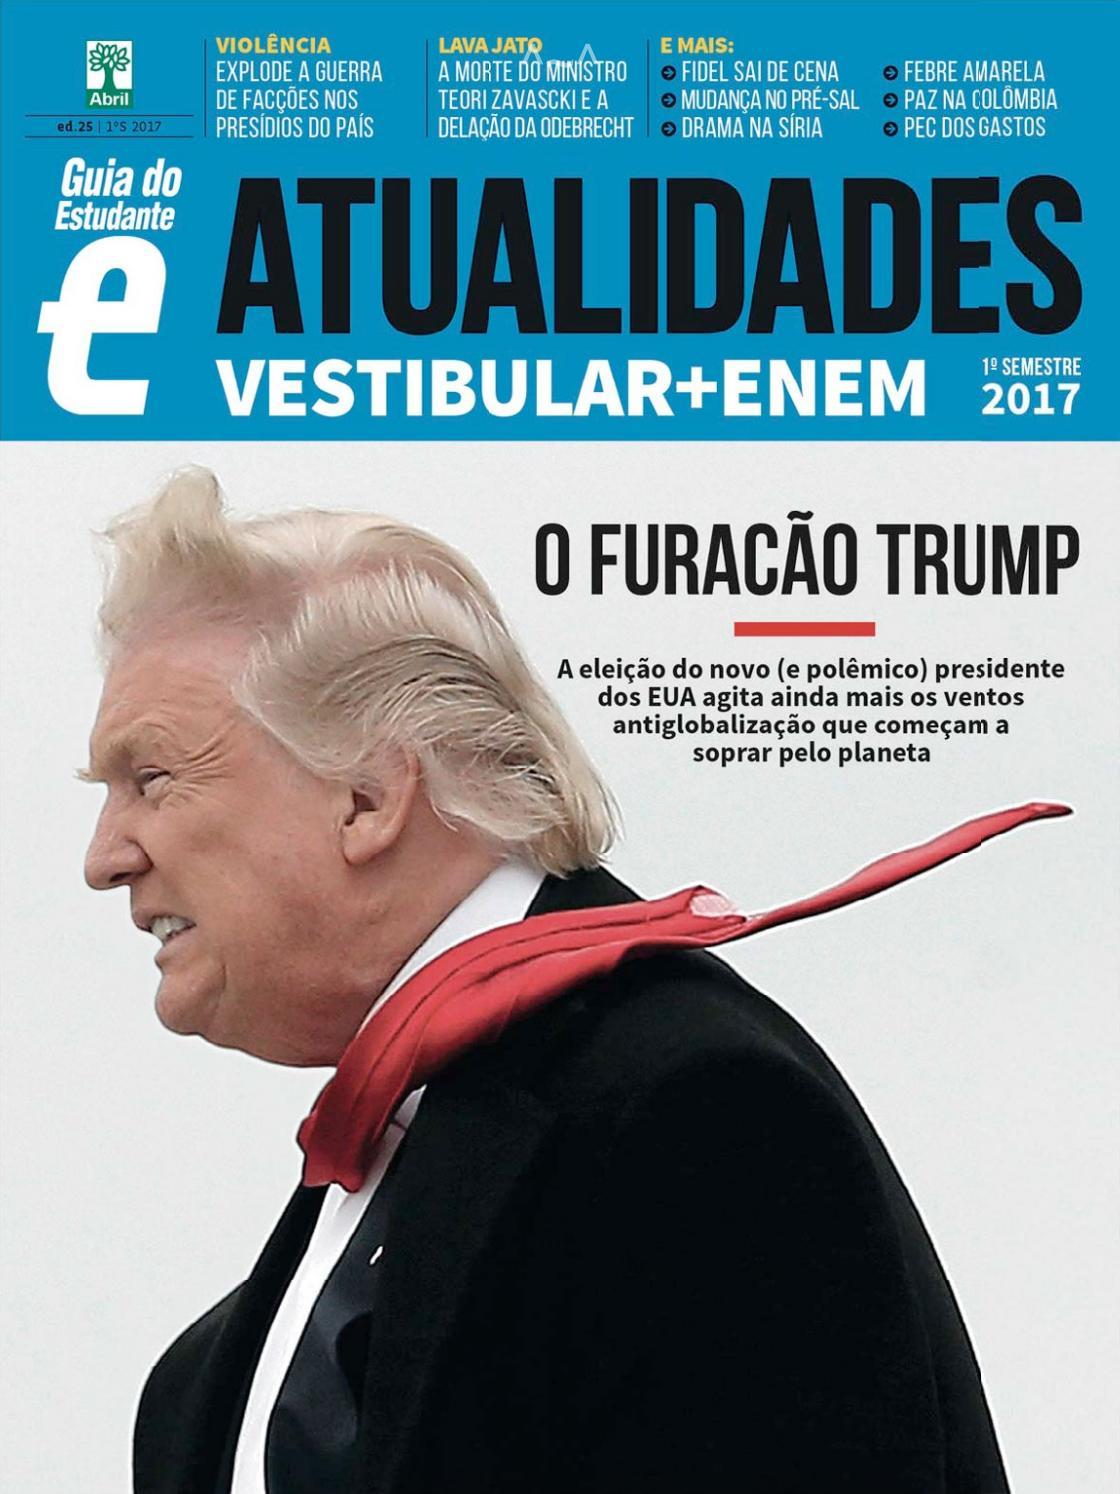 Atualidades by Léia Neves - issuu ba0ef5dcb0